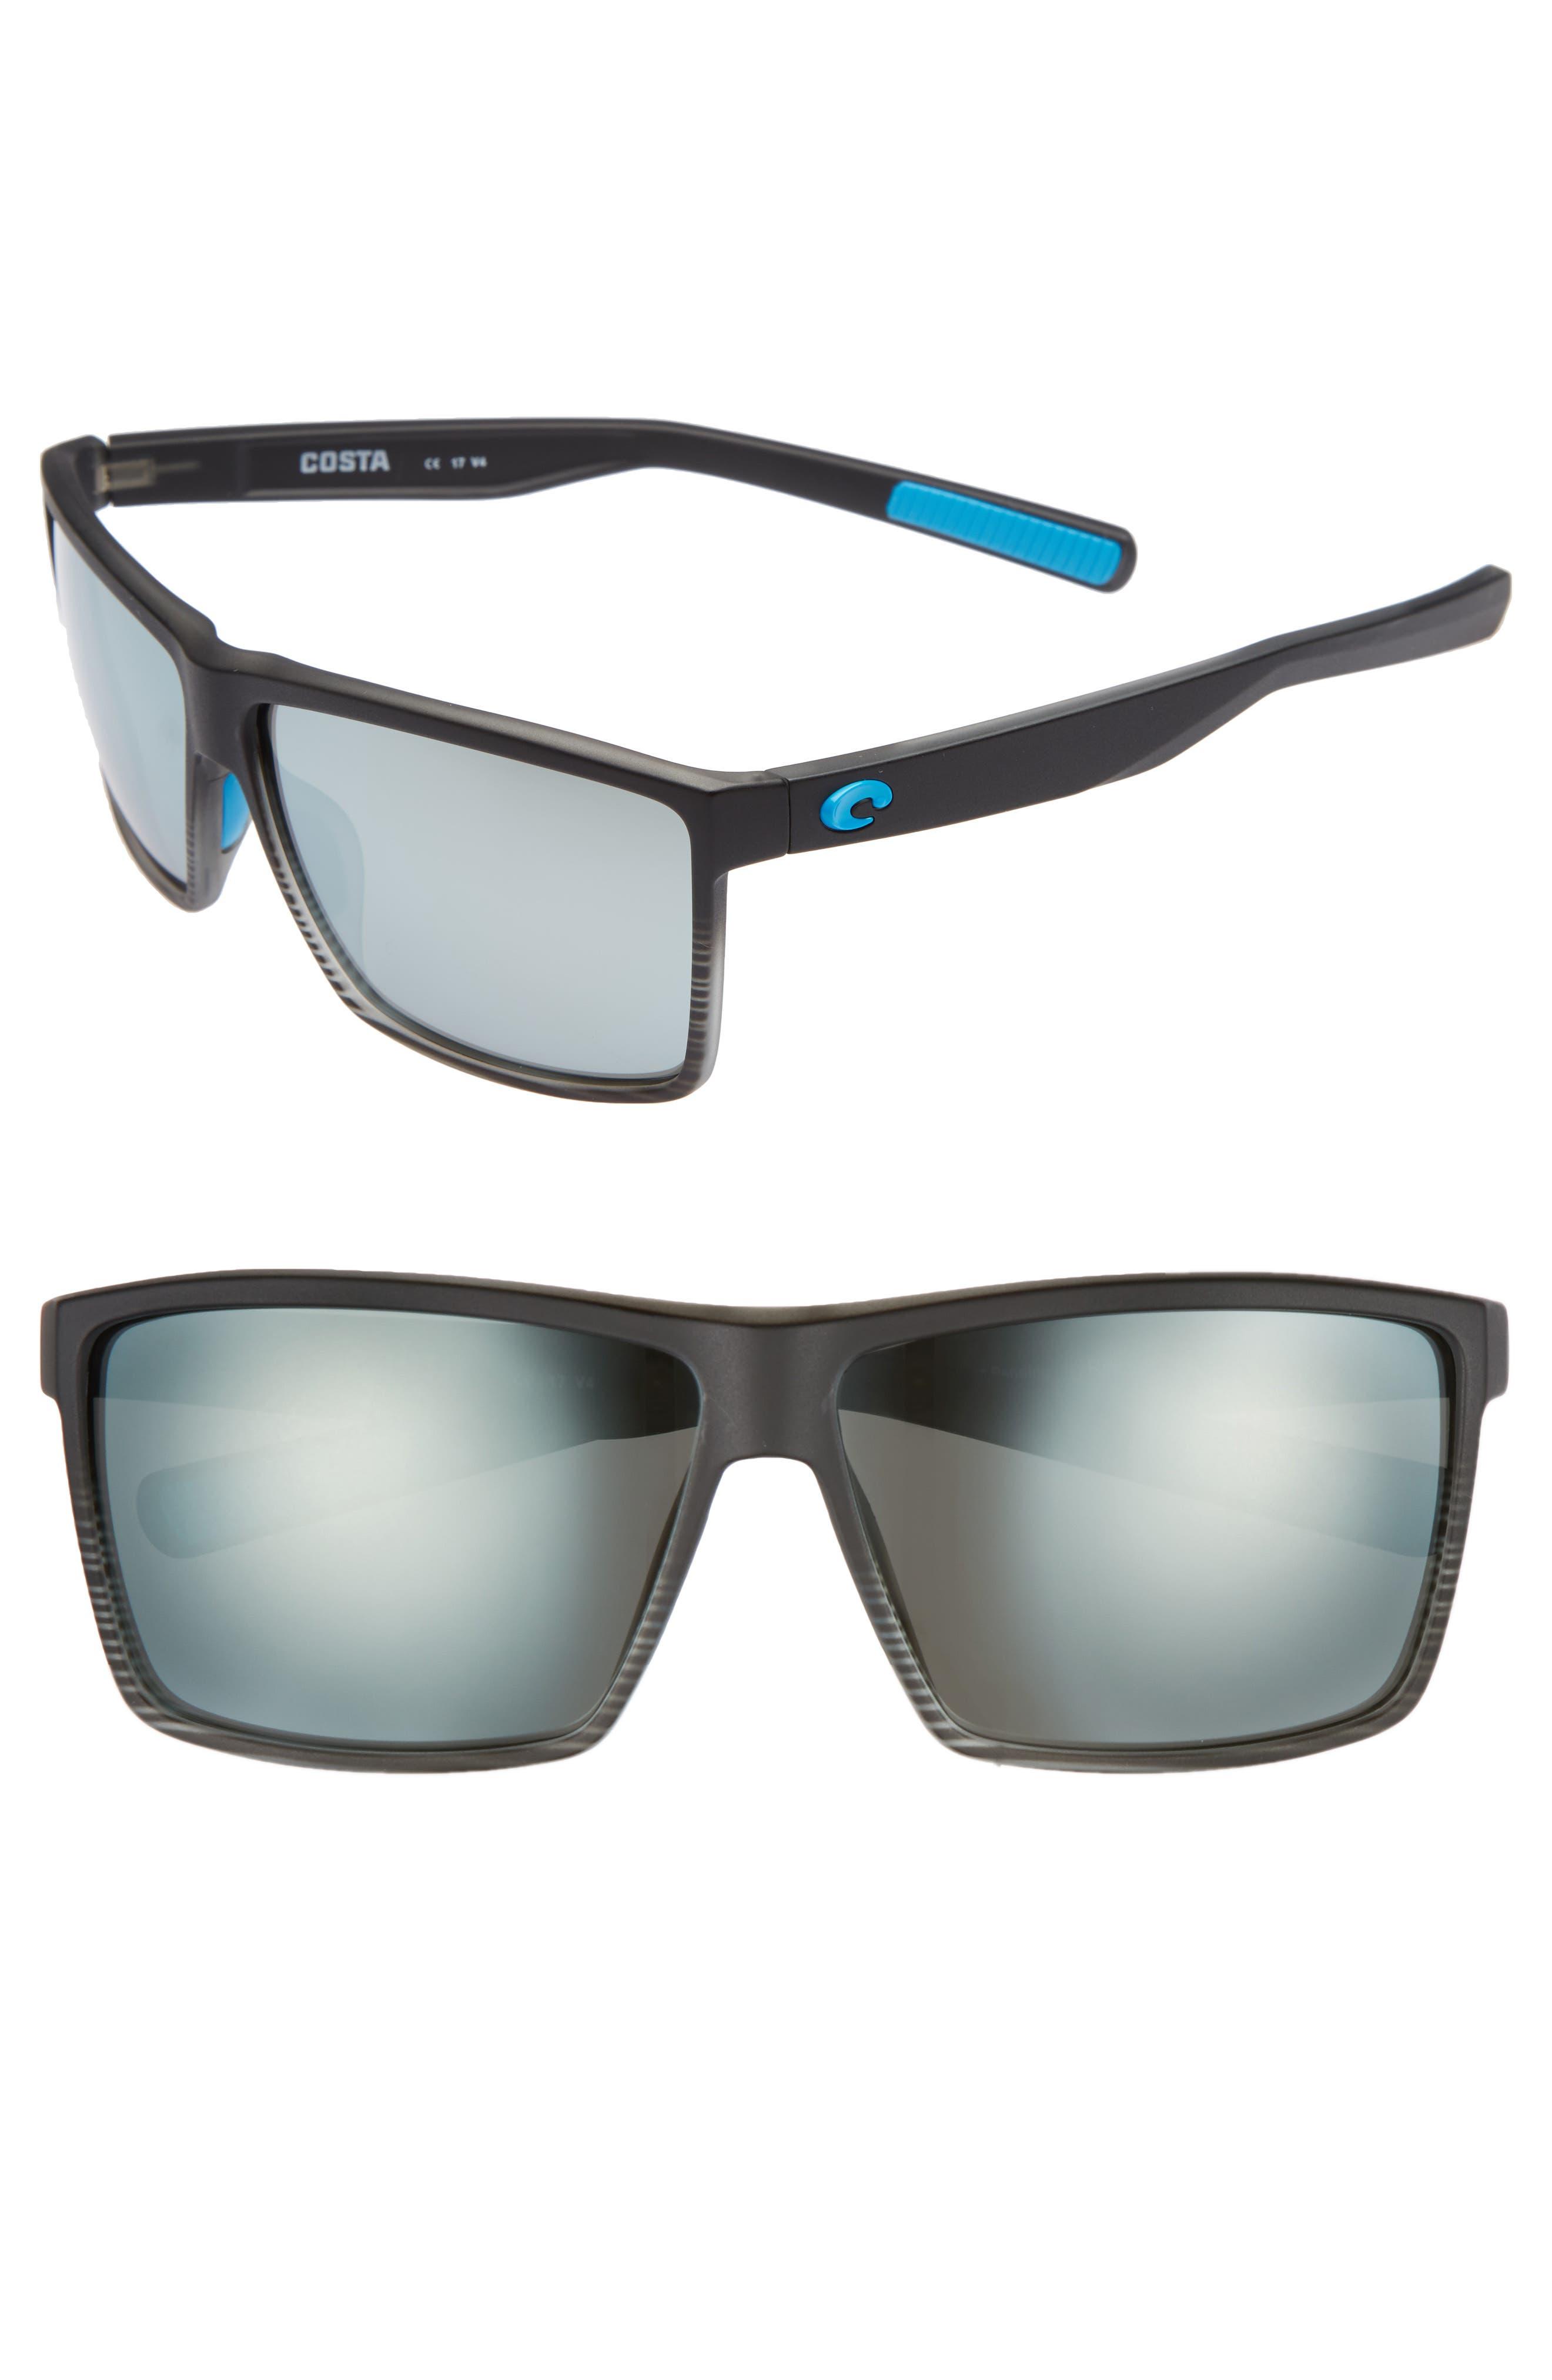 Rincon 60mm Polarized Sunglasses,                         Main,                         color, SMOKE CRYSTAL/ SILVER MIRROR